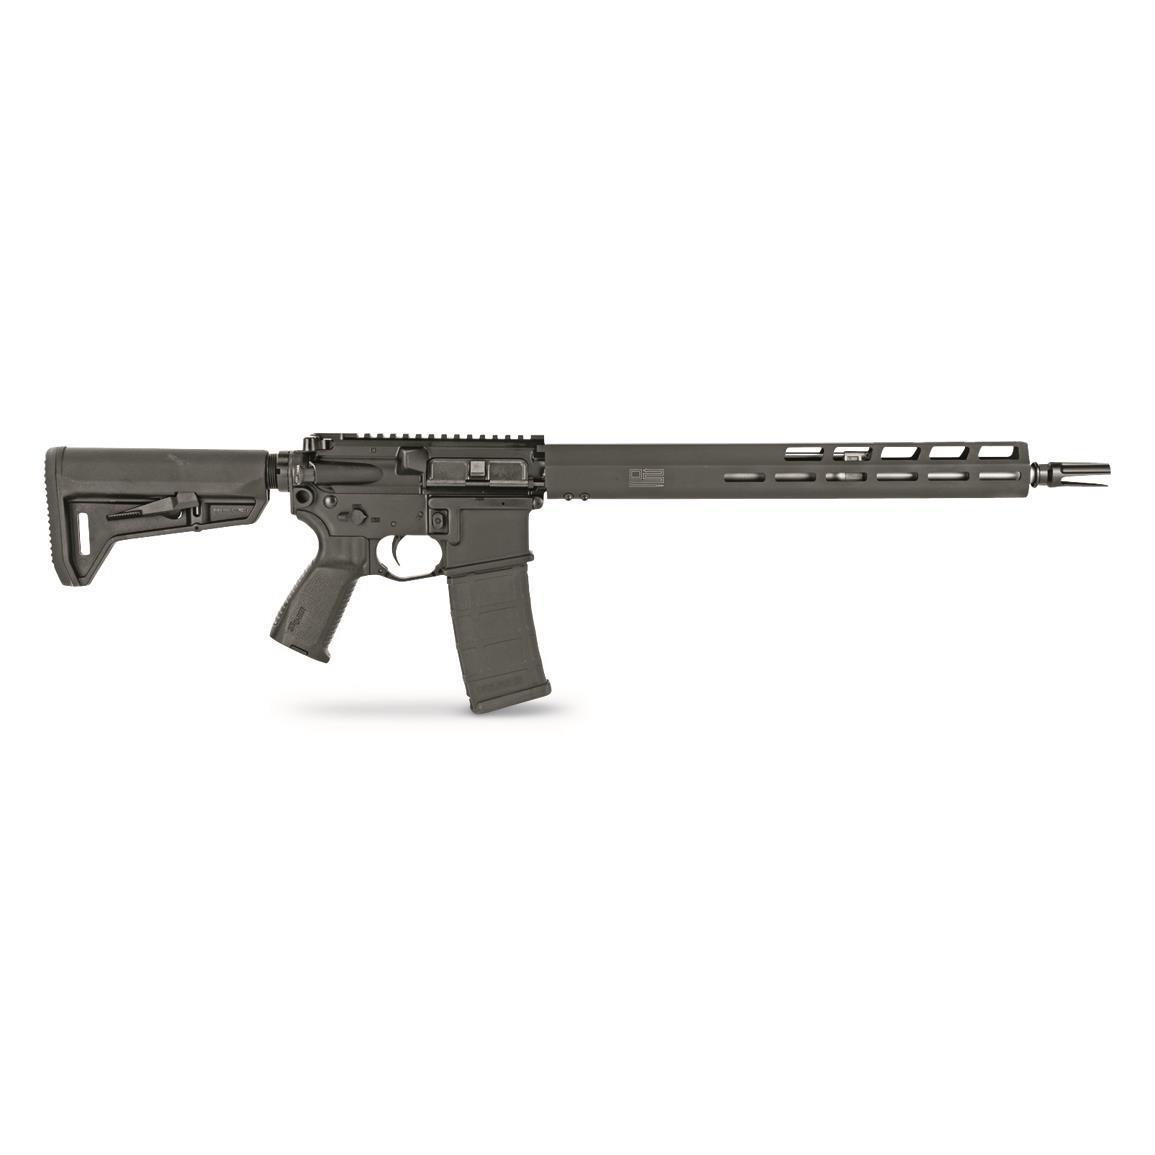 SIG SAUER M400 Tread AR-15, Semi-automatic, 5.56 NATO/.223 Rem ...